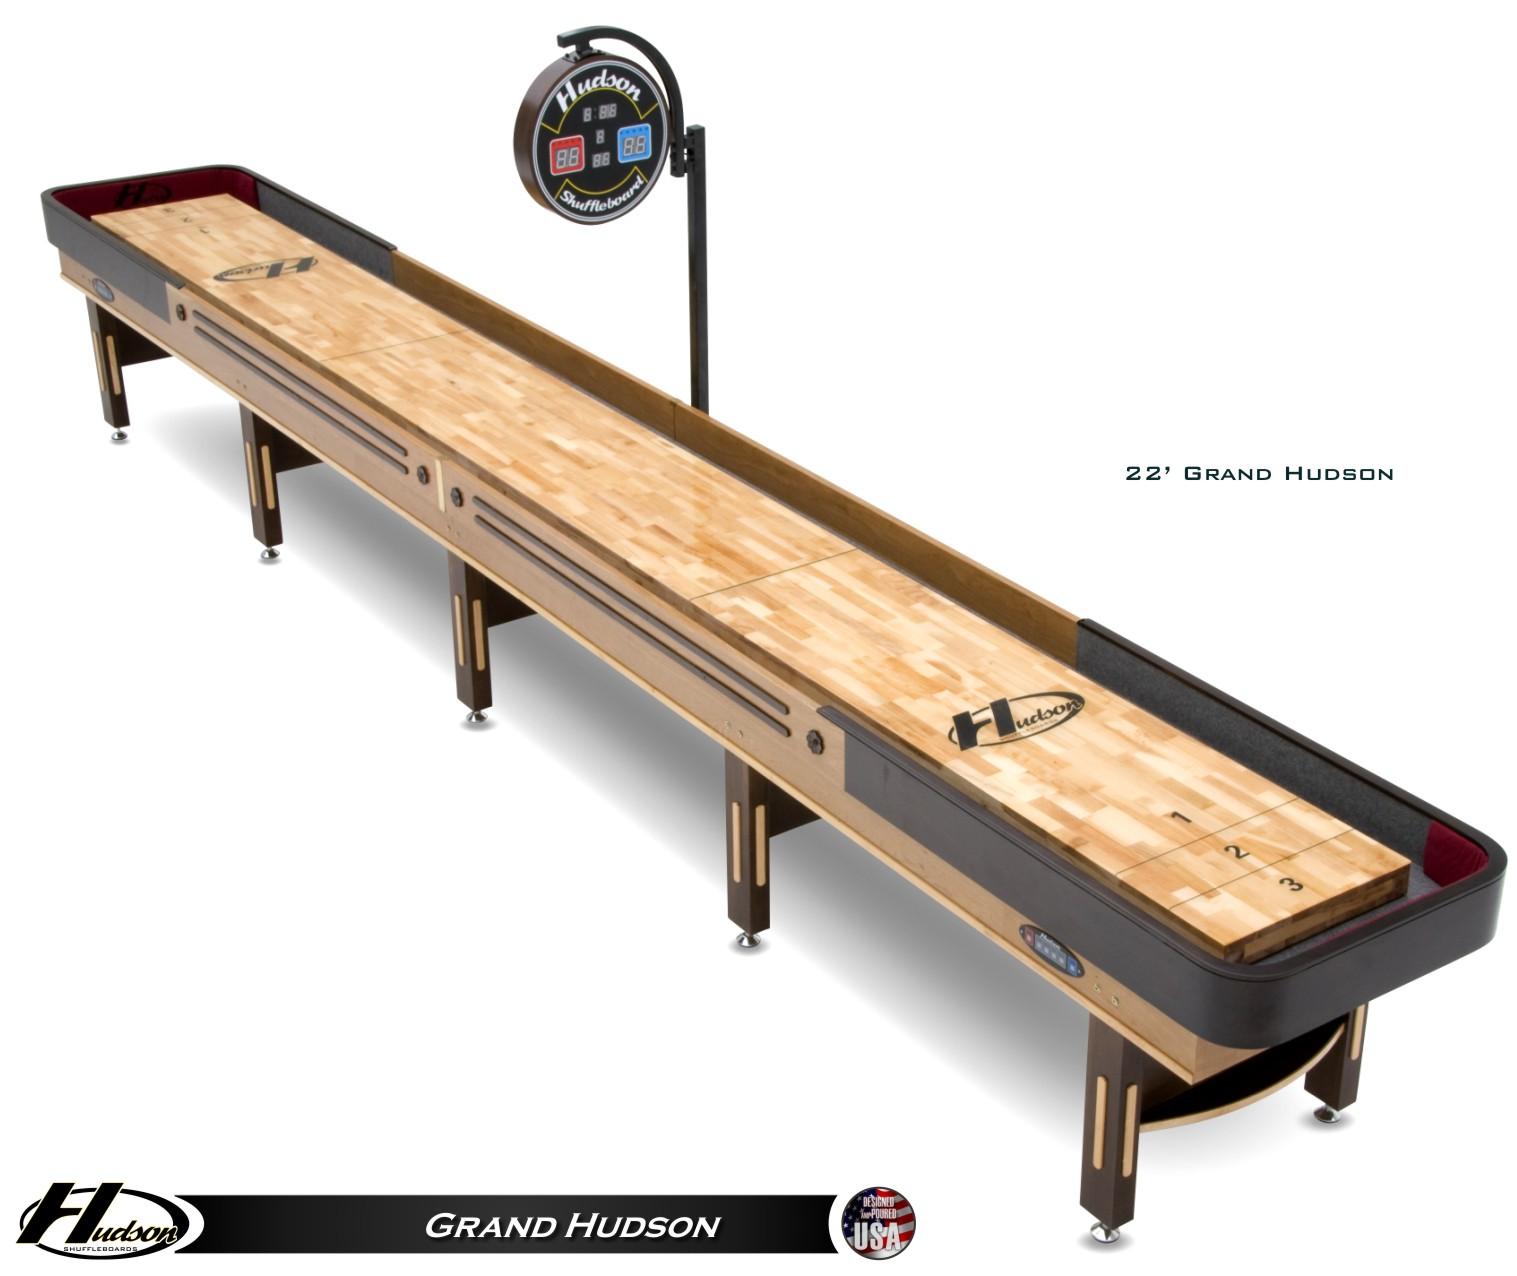 Genial 14u0027 Grand Hudson Shuffleboard Table